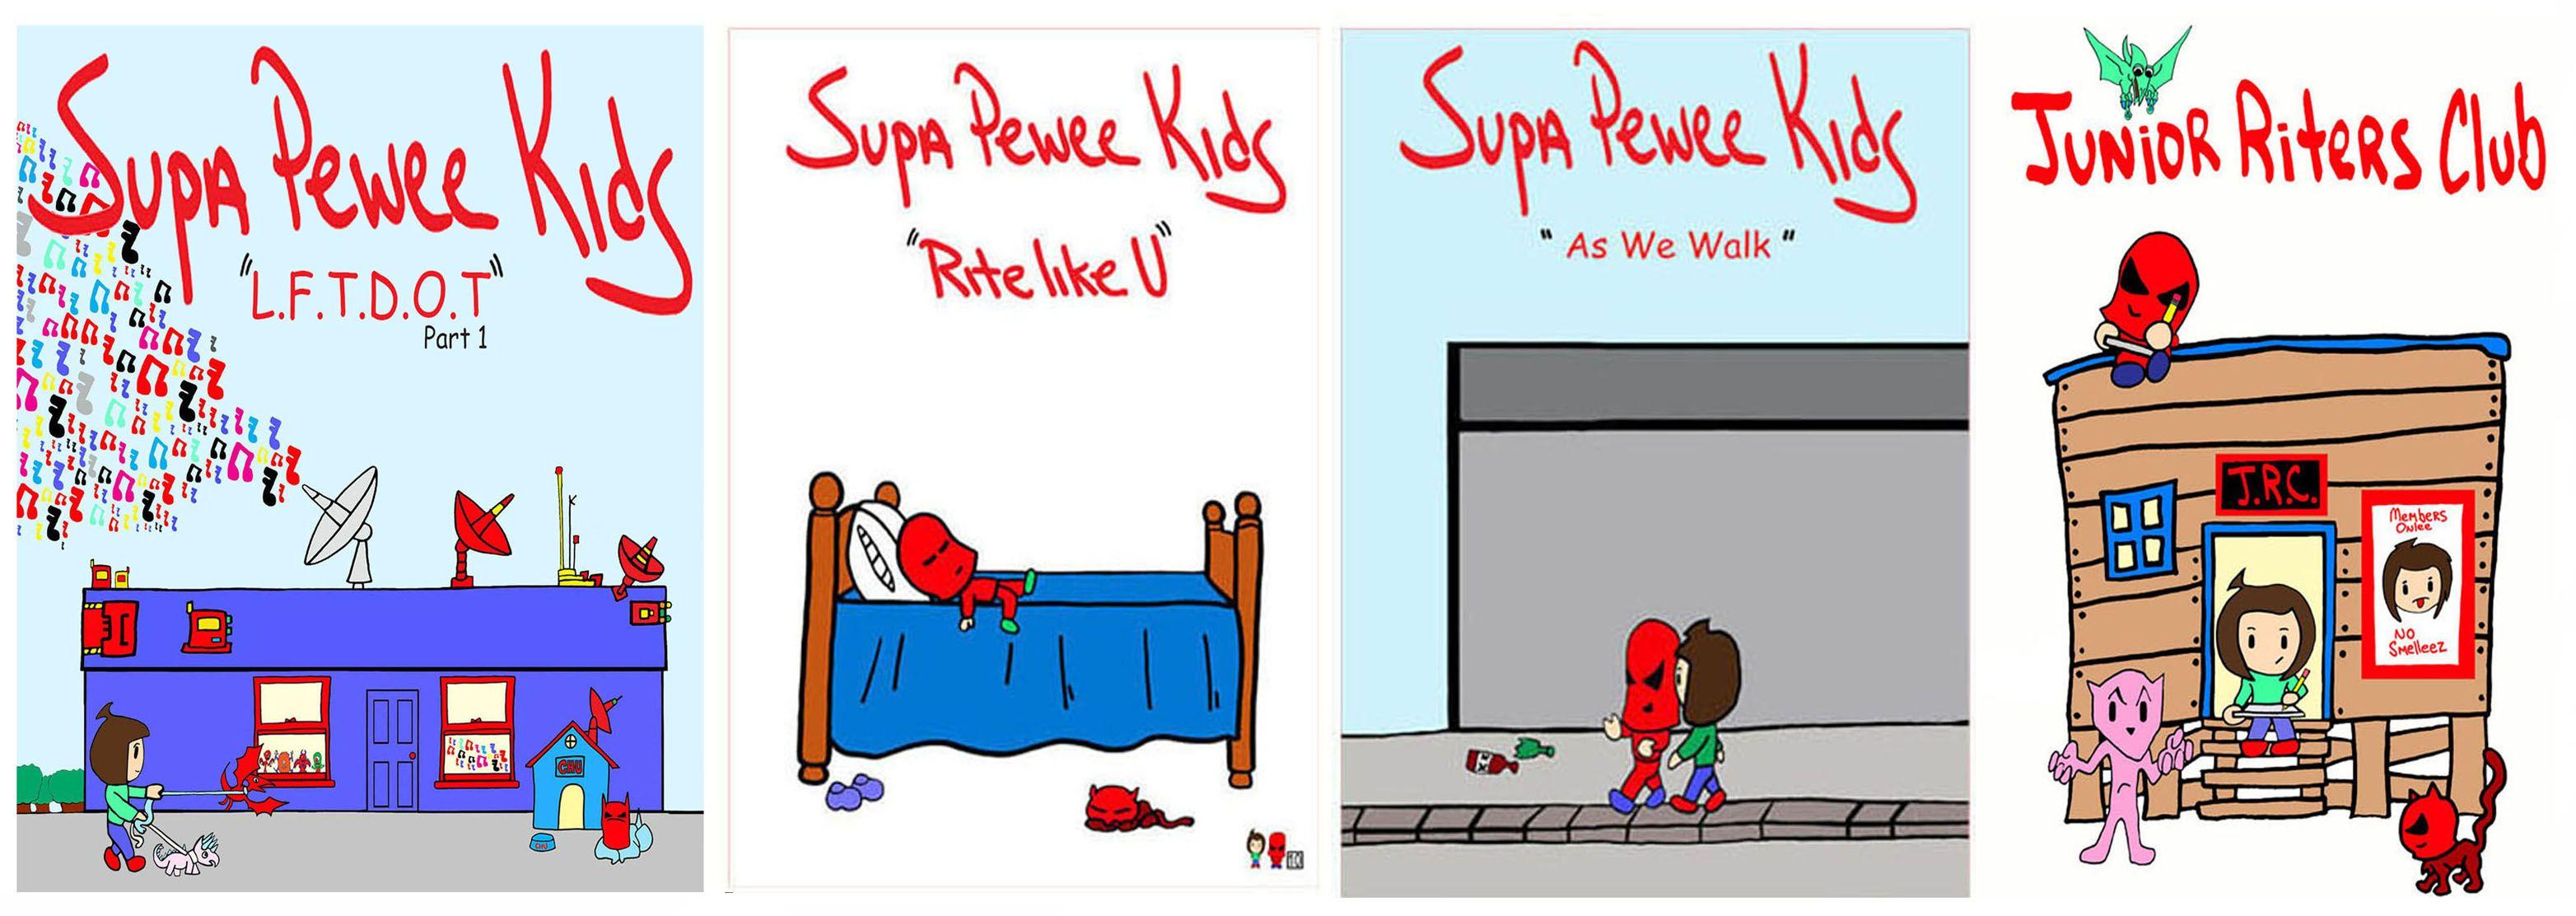 Super Pee Wee Kids B Pop Mason Ali P Picture Car Punk Pee Wee Pop